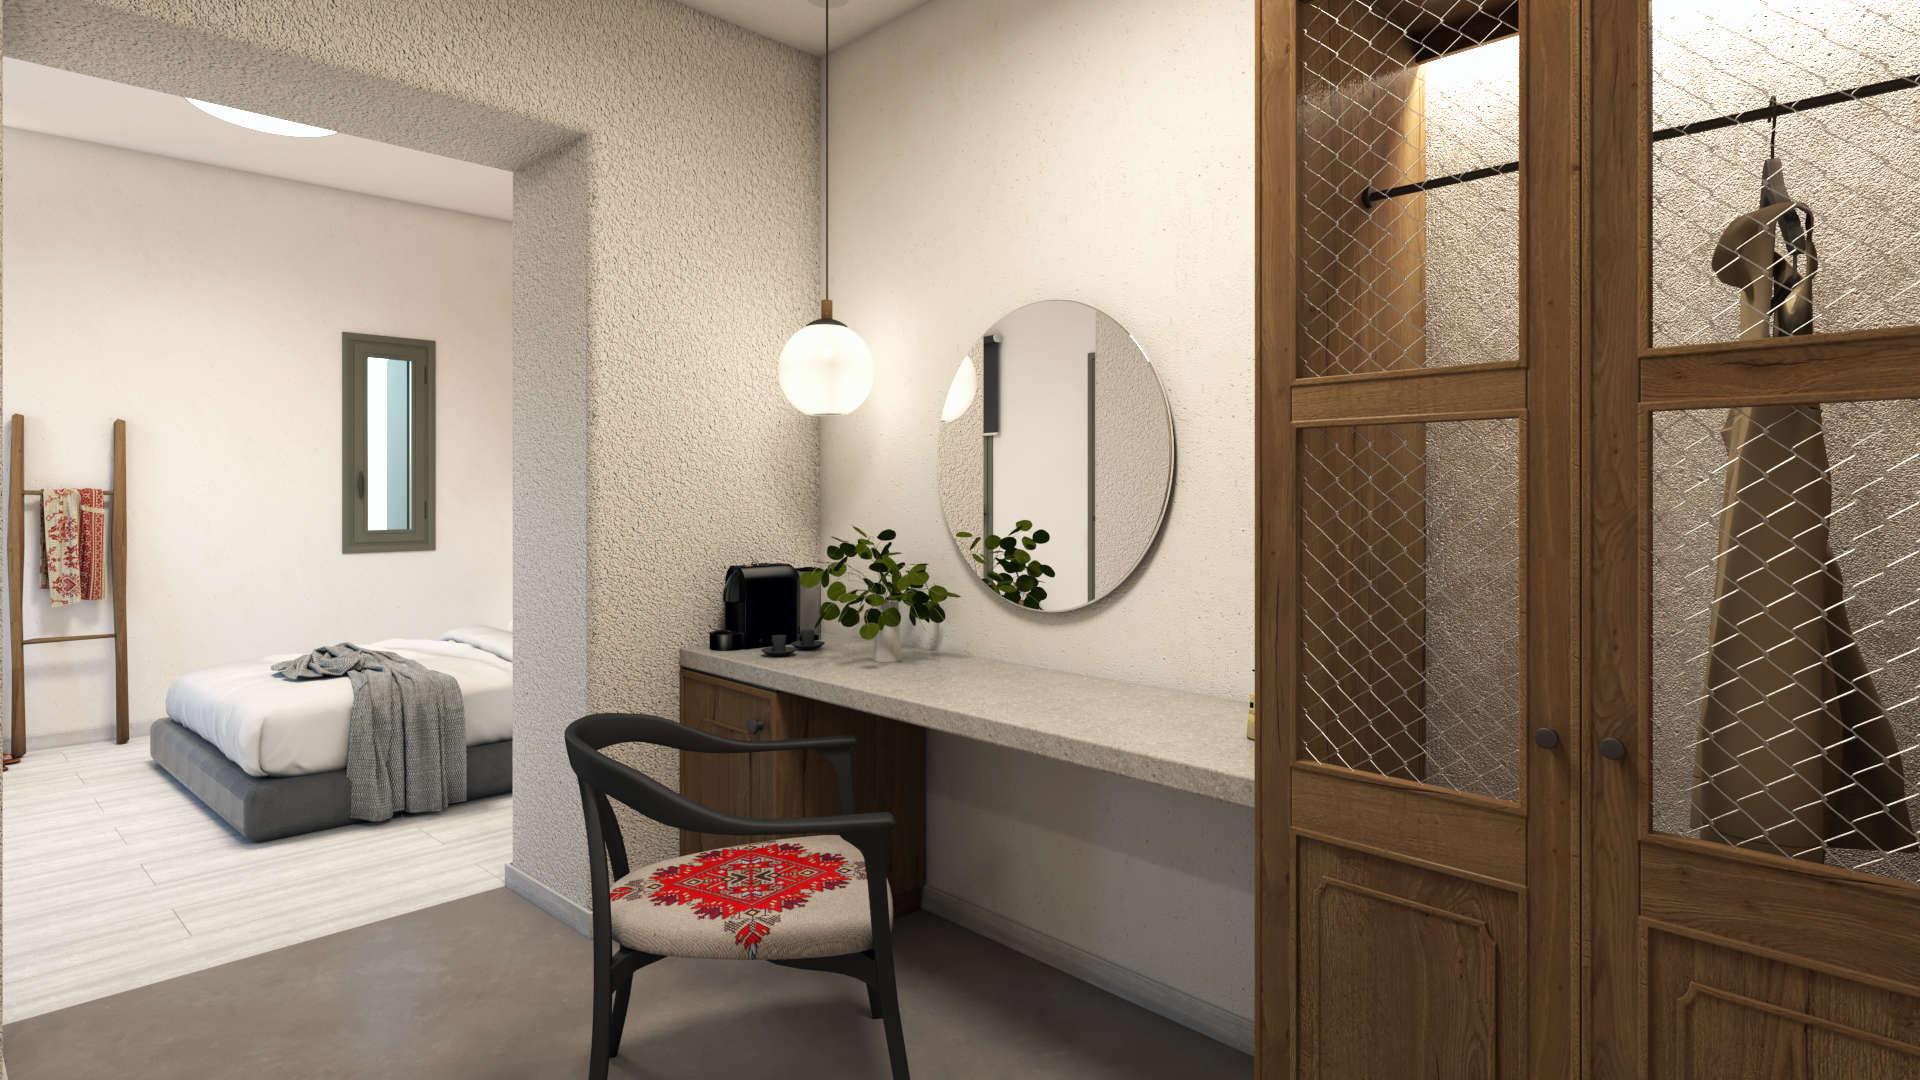 Hotel in a village, suite, interior design, bathroom ante room, dressing table,wardrobe. Τουριστικό κατάλυμα σε οικισμό, σουίτα, προθάλαμος μπάνιου, ντουλάπα, γραφείο.